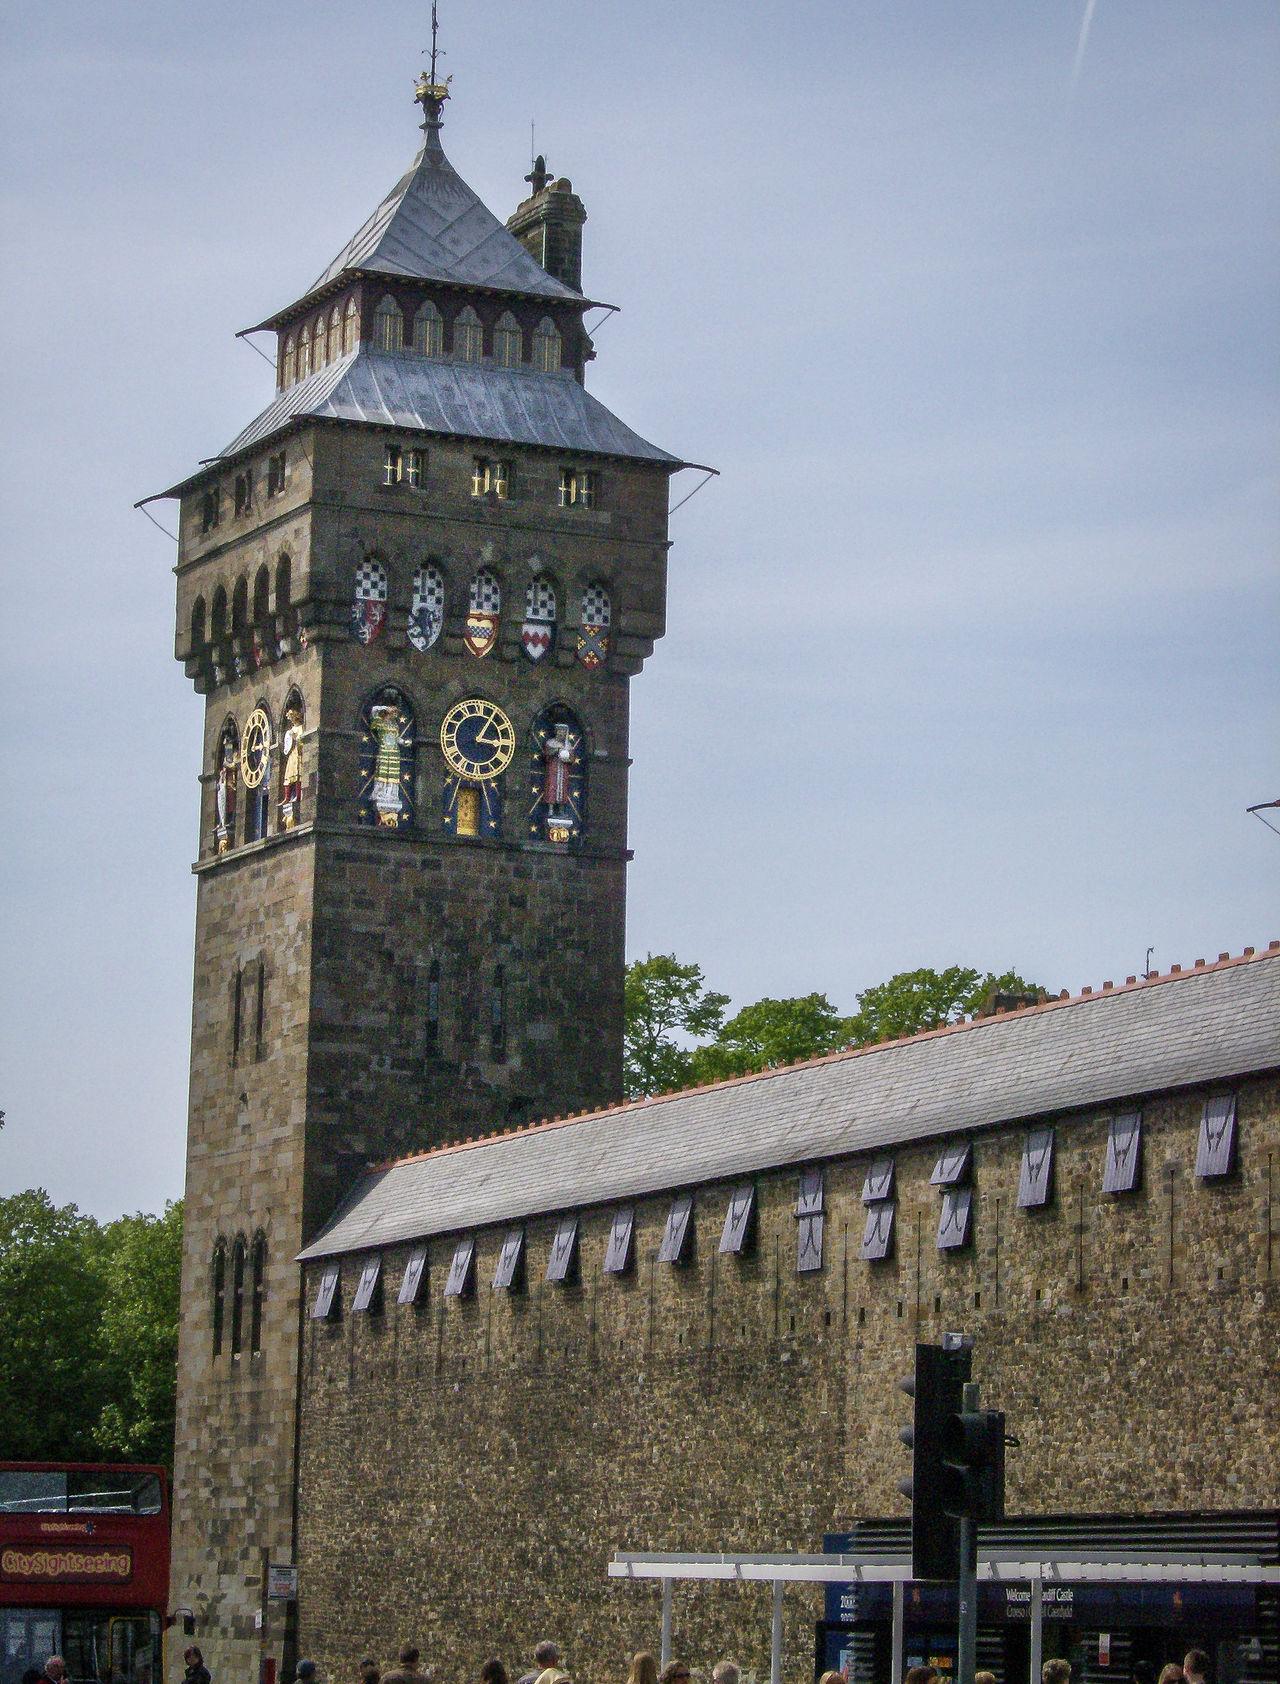 Architecture Building Exterior Built Structure Caerdydd Cardiff Castello Castle City Clock Clock Tower Day Galles Gran Bretagna Great Britain Großbritannien No People Outdoors Schloss Schloss Sky Tower Tree Wales